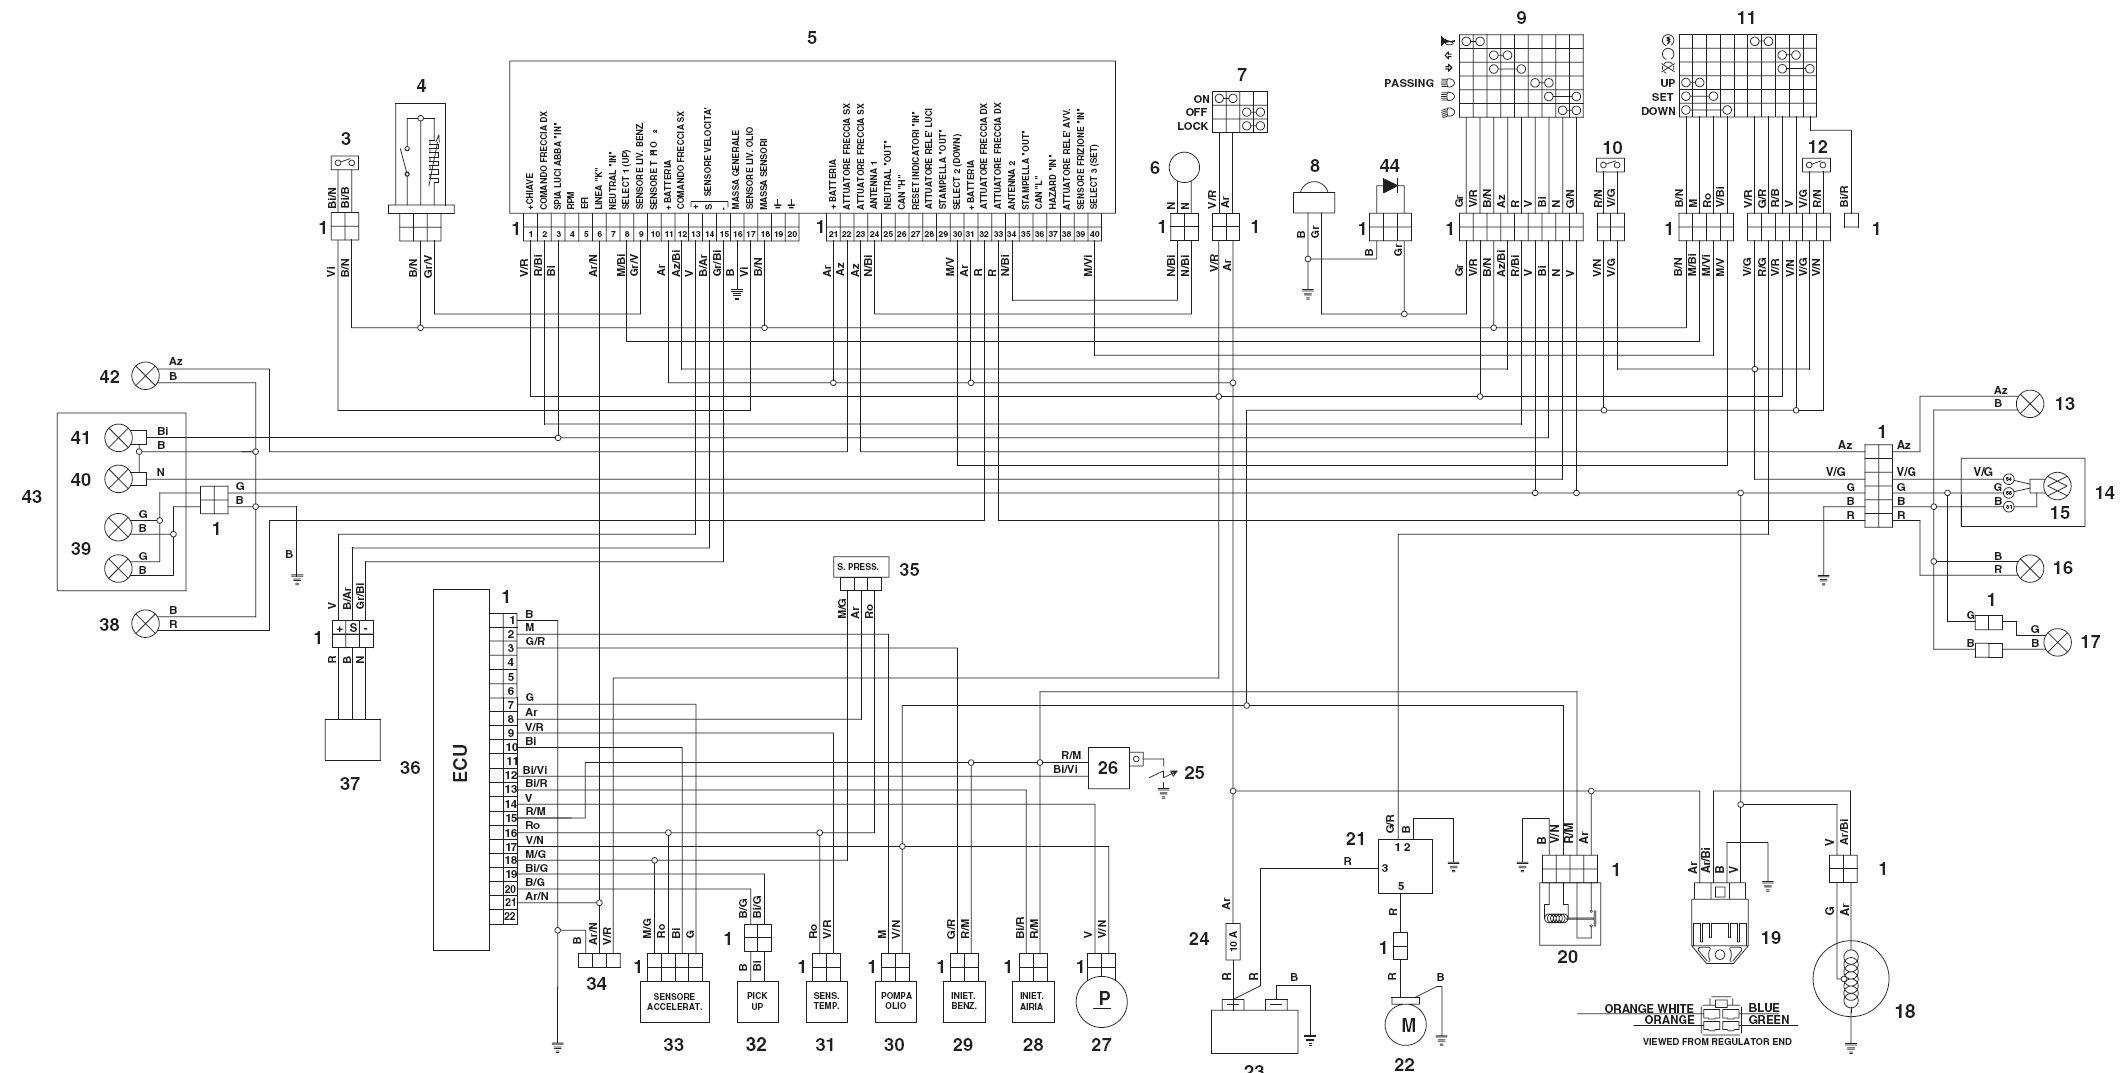 DIAGRAM] Aprilia Ditech Wiring Diagram FULL Version HD Quality Wiring  Diagram - CDIAGRAM.SHIA-LABEOUF.FR Diagram Database - Shia LaBeouf